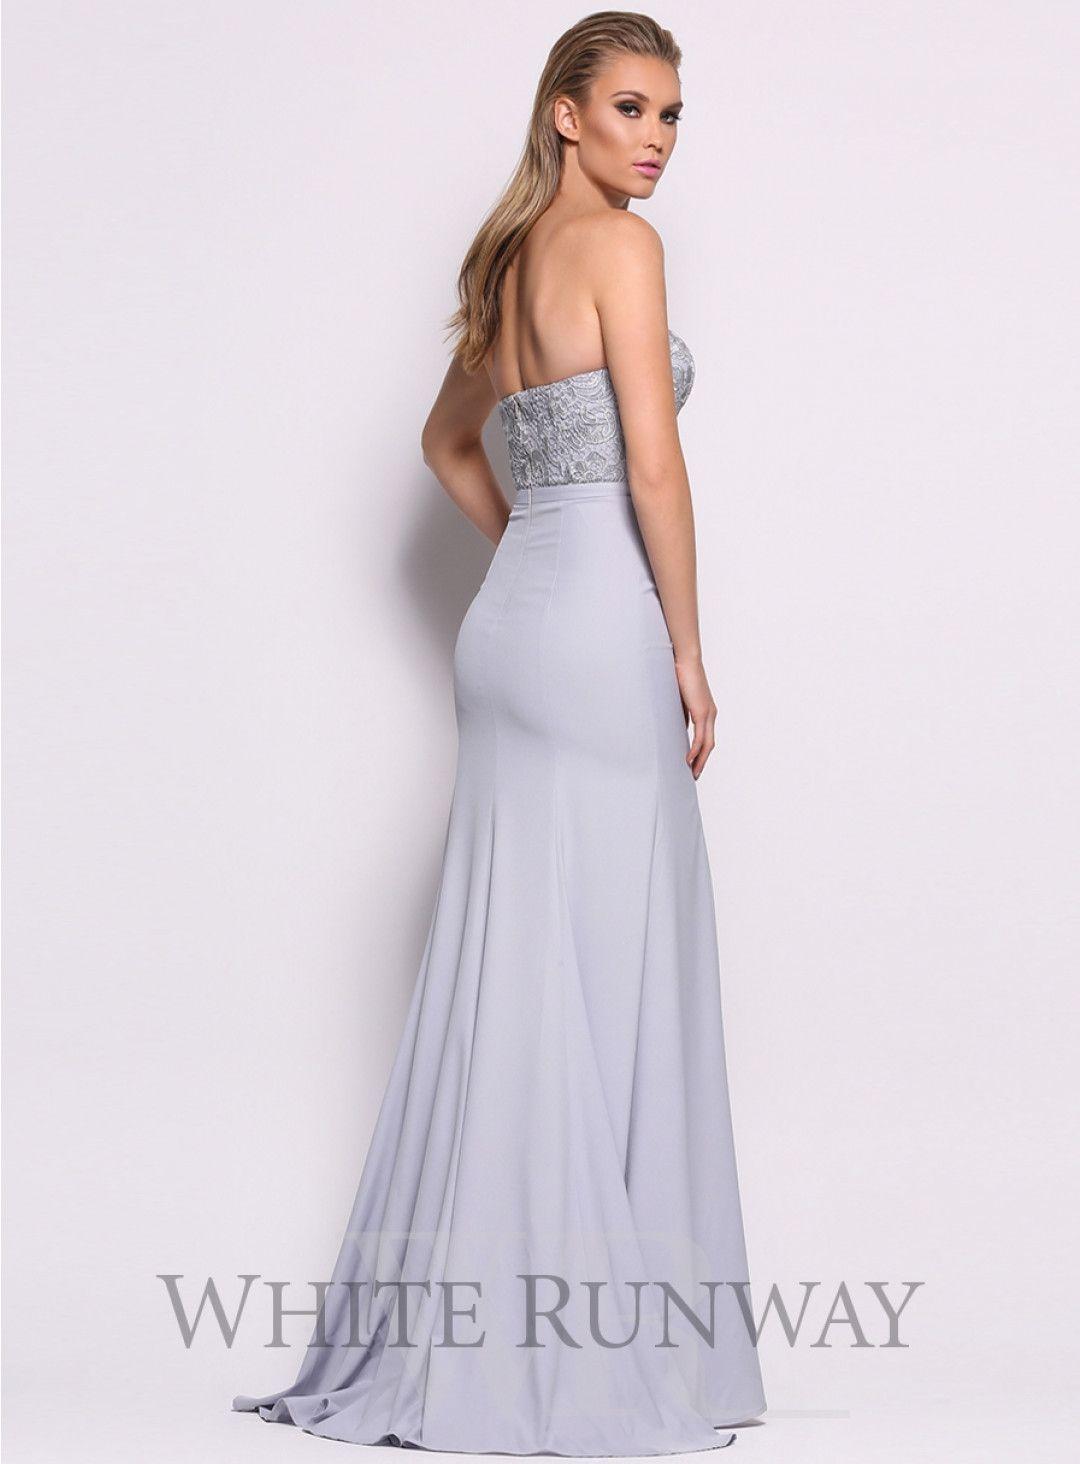 Blue louisa dress an elegant floor length gown by elle zeitoune a